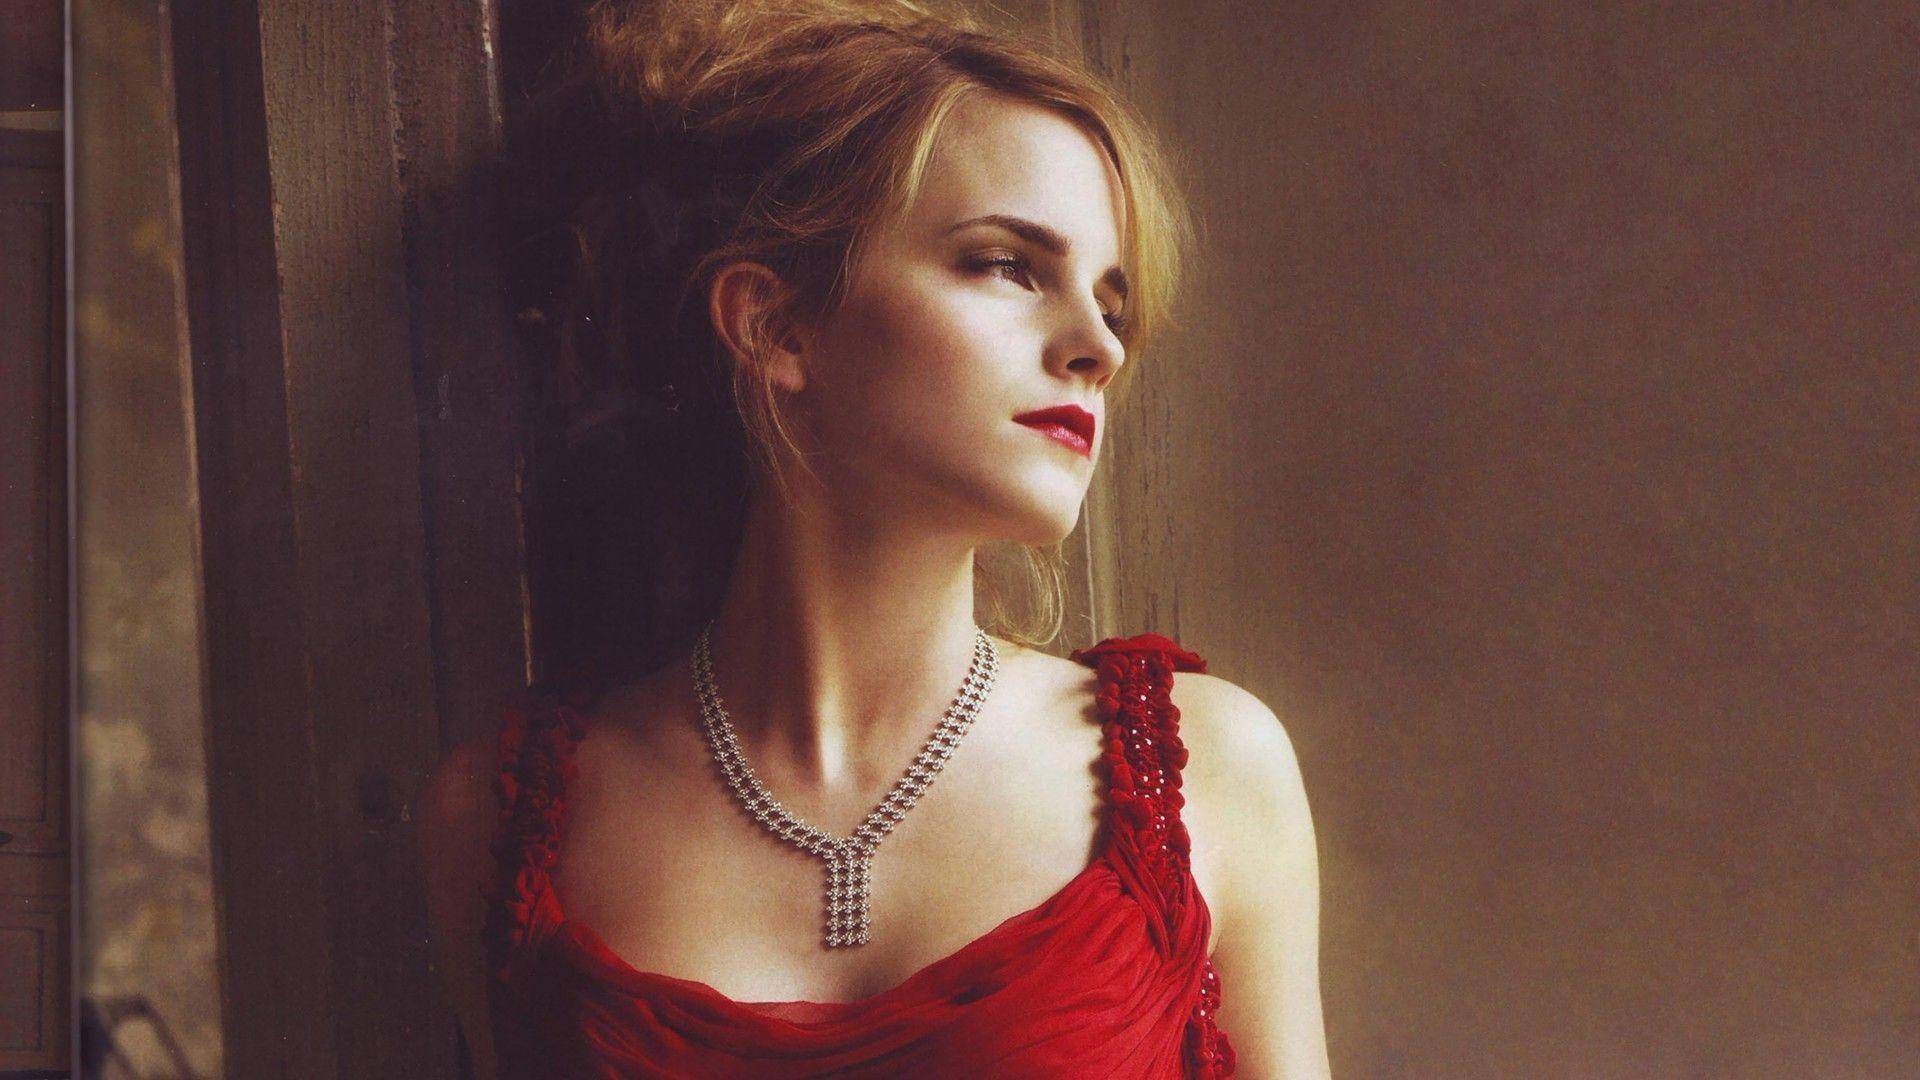 Emma Watson Wallpaper #